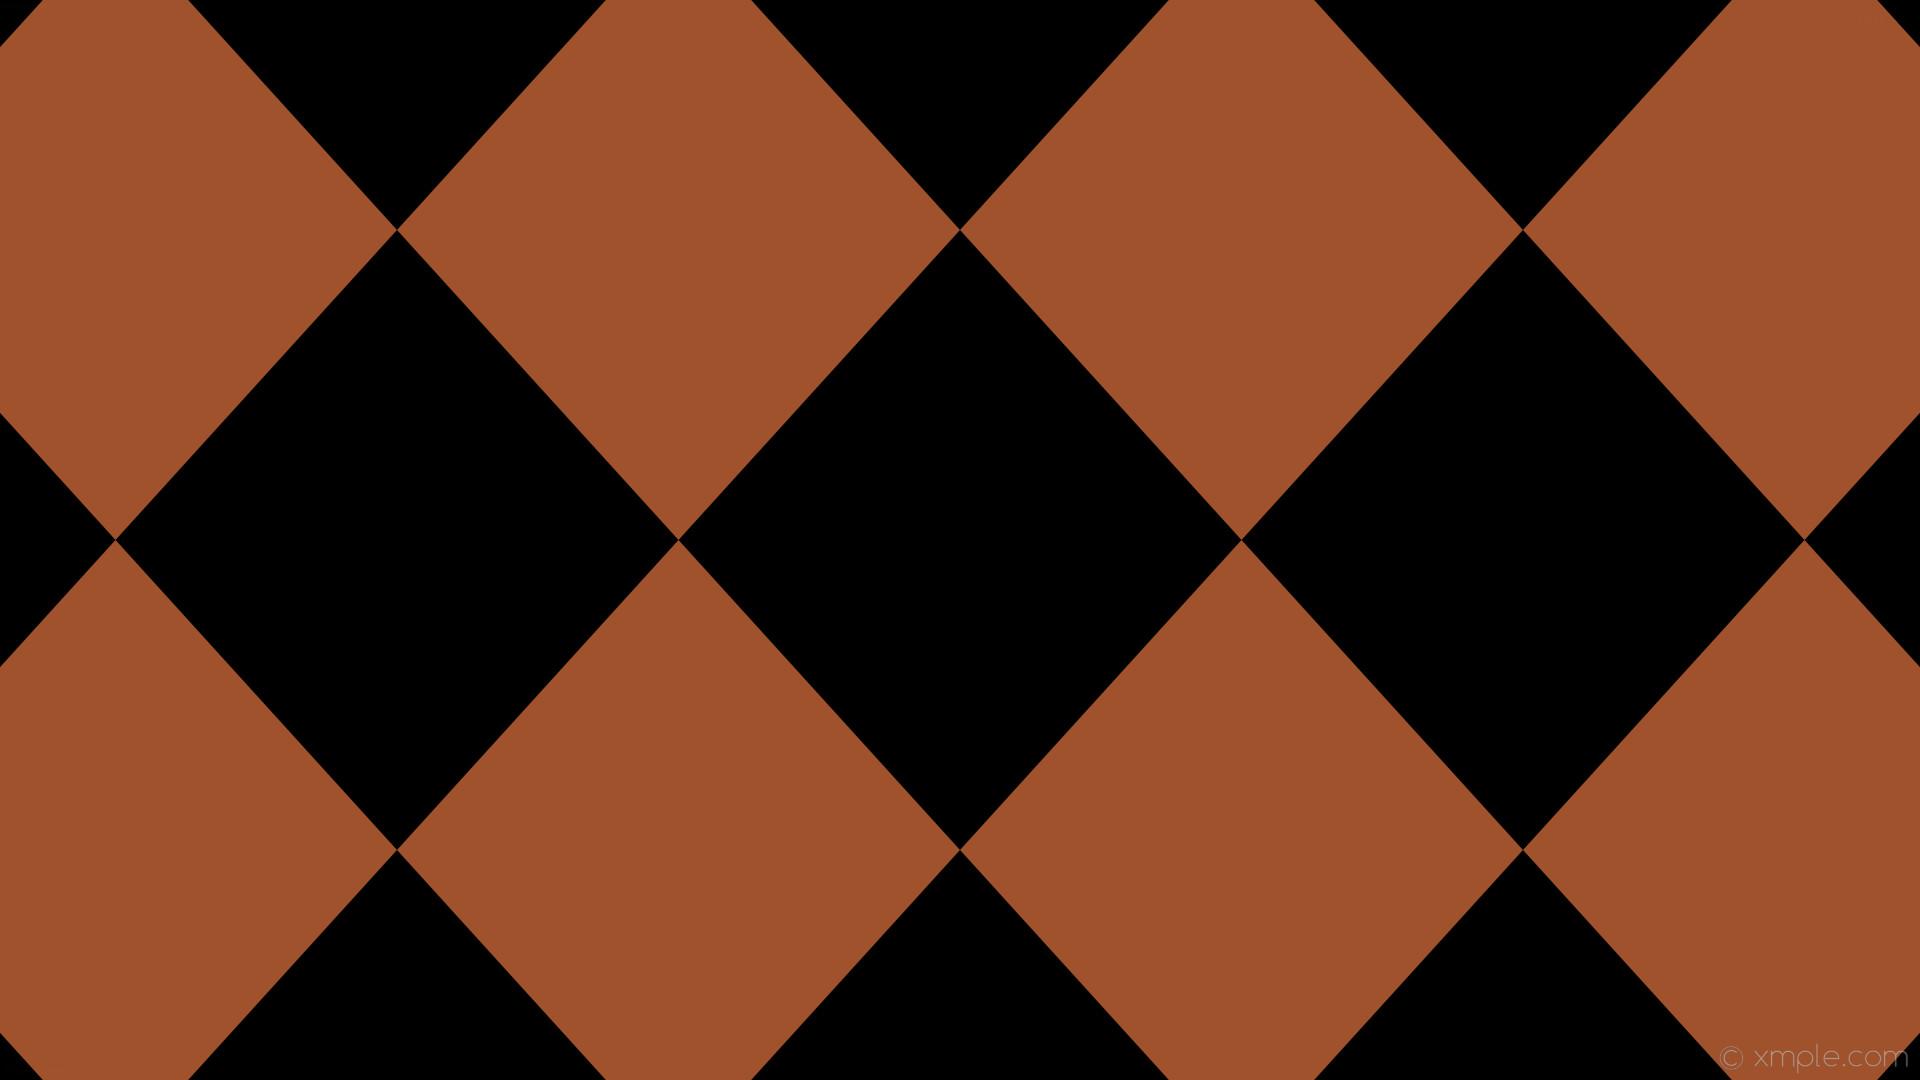 wallpaper lozenge brown rhombus diamond black sienna #000000 #a0522d 90°  620px 563px